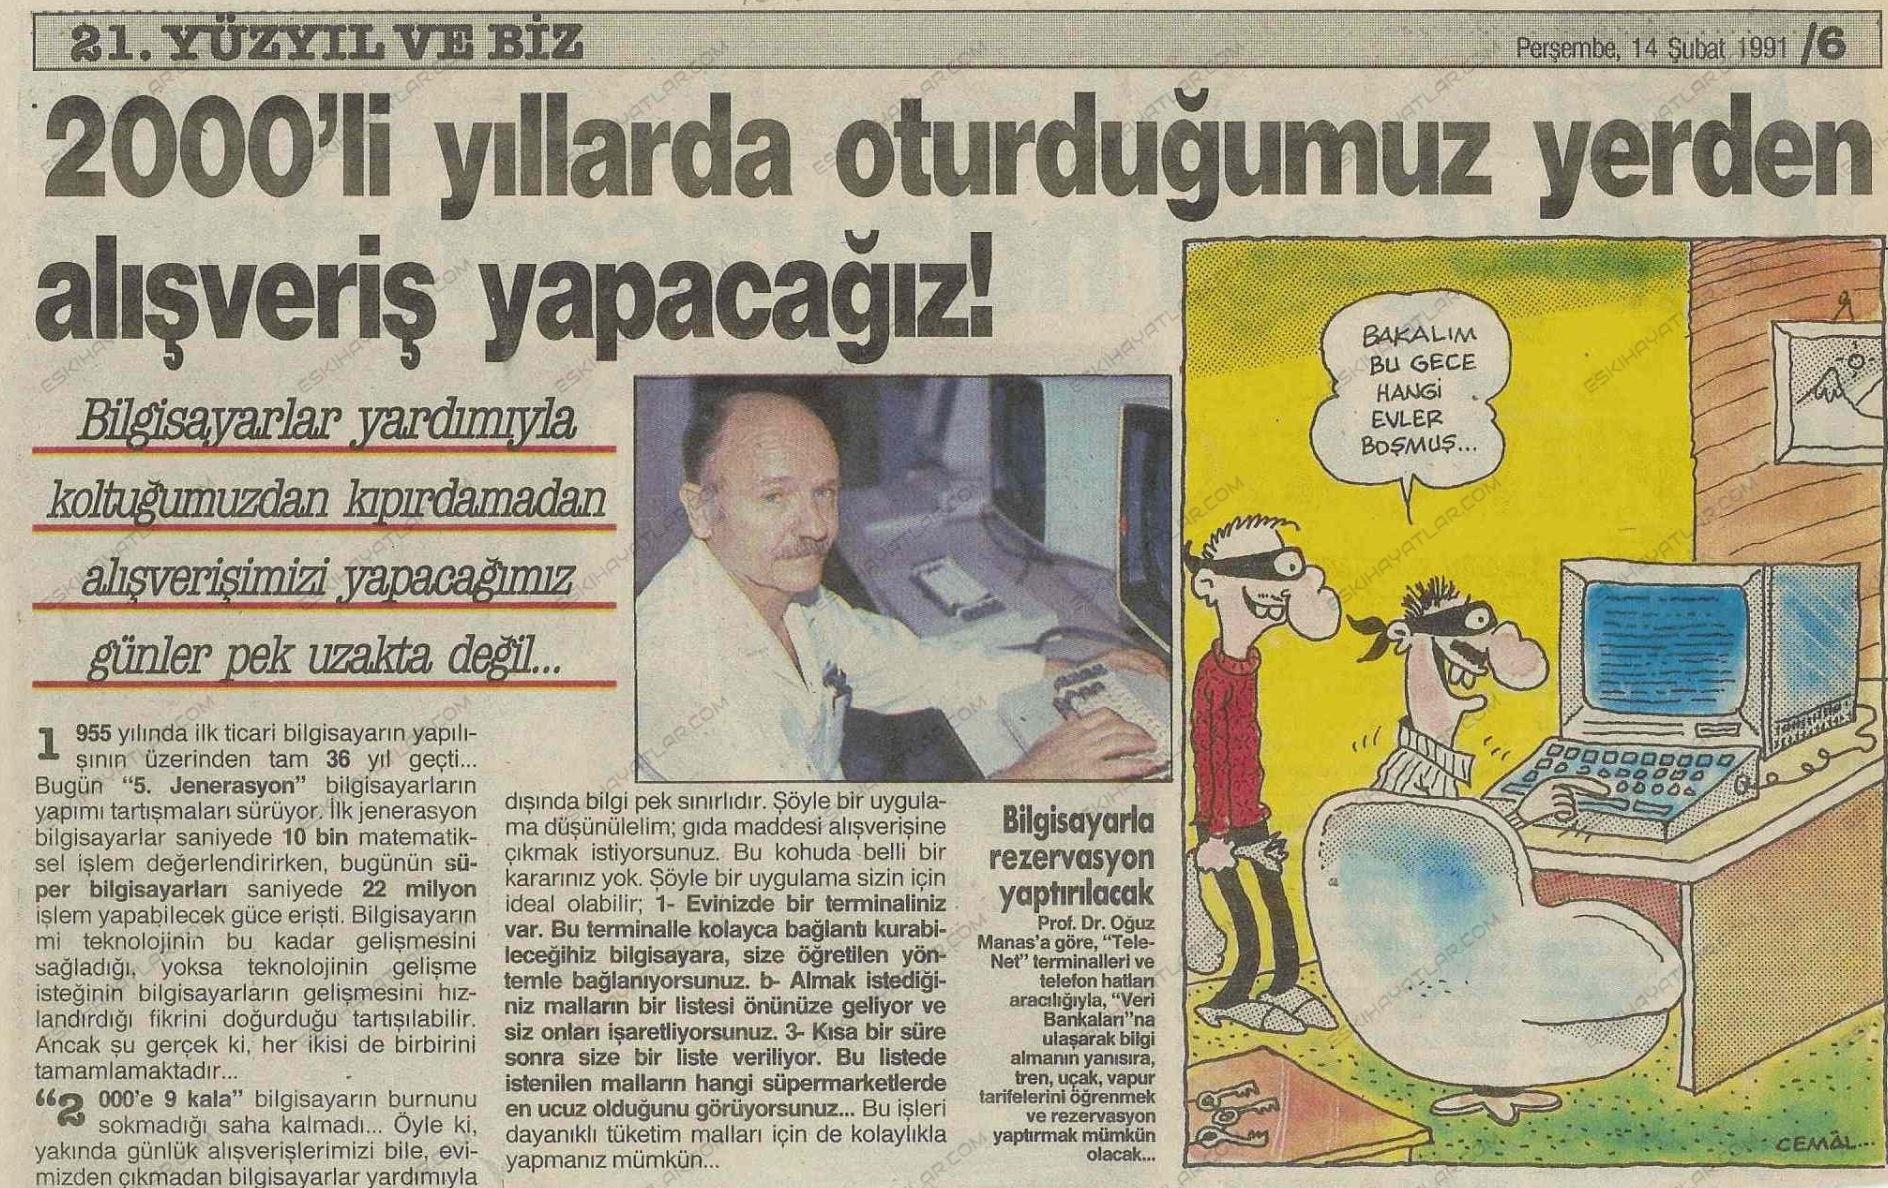 oguz-manas-earn-gazete-haberi